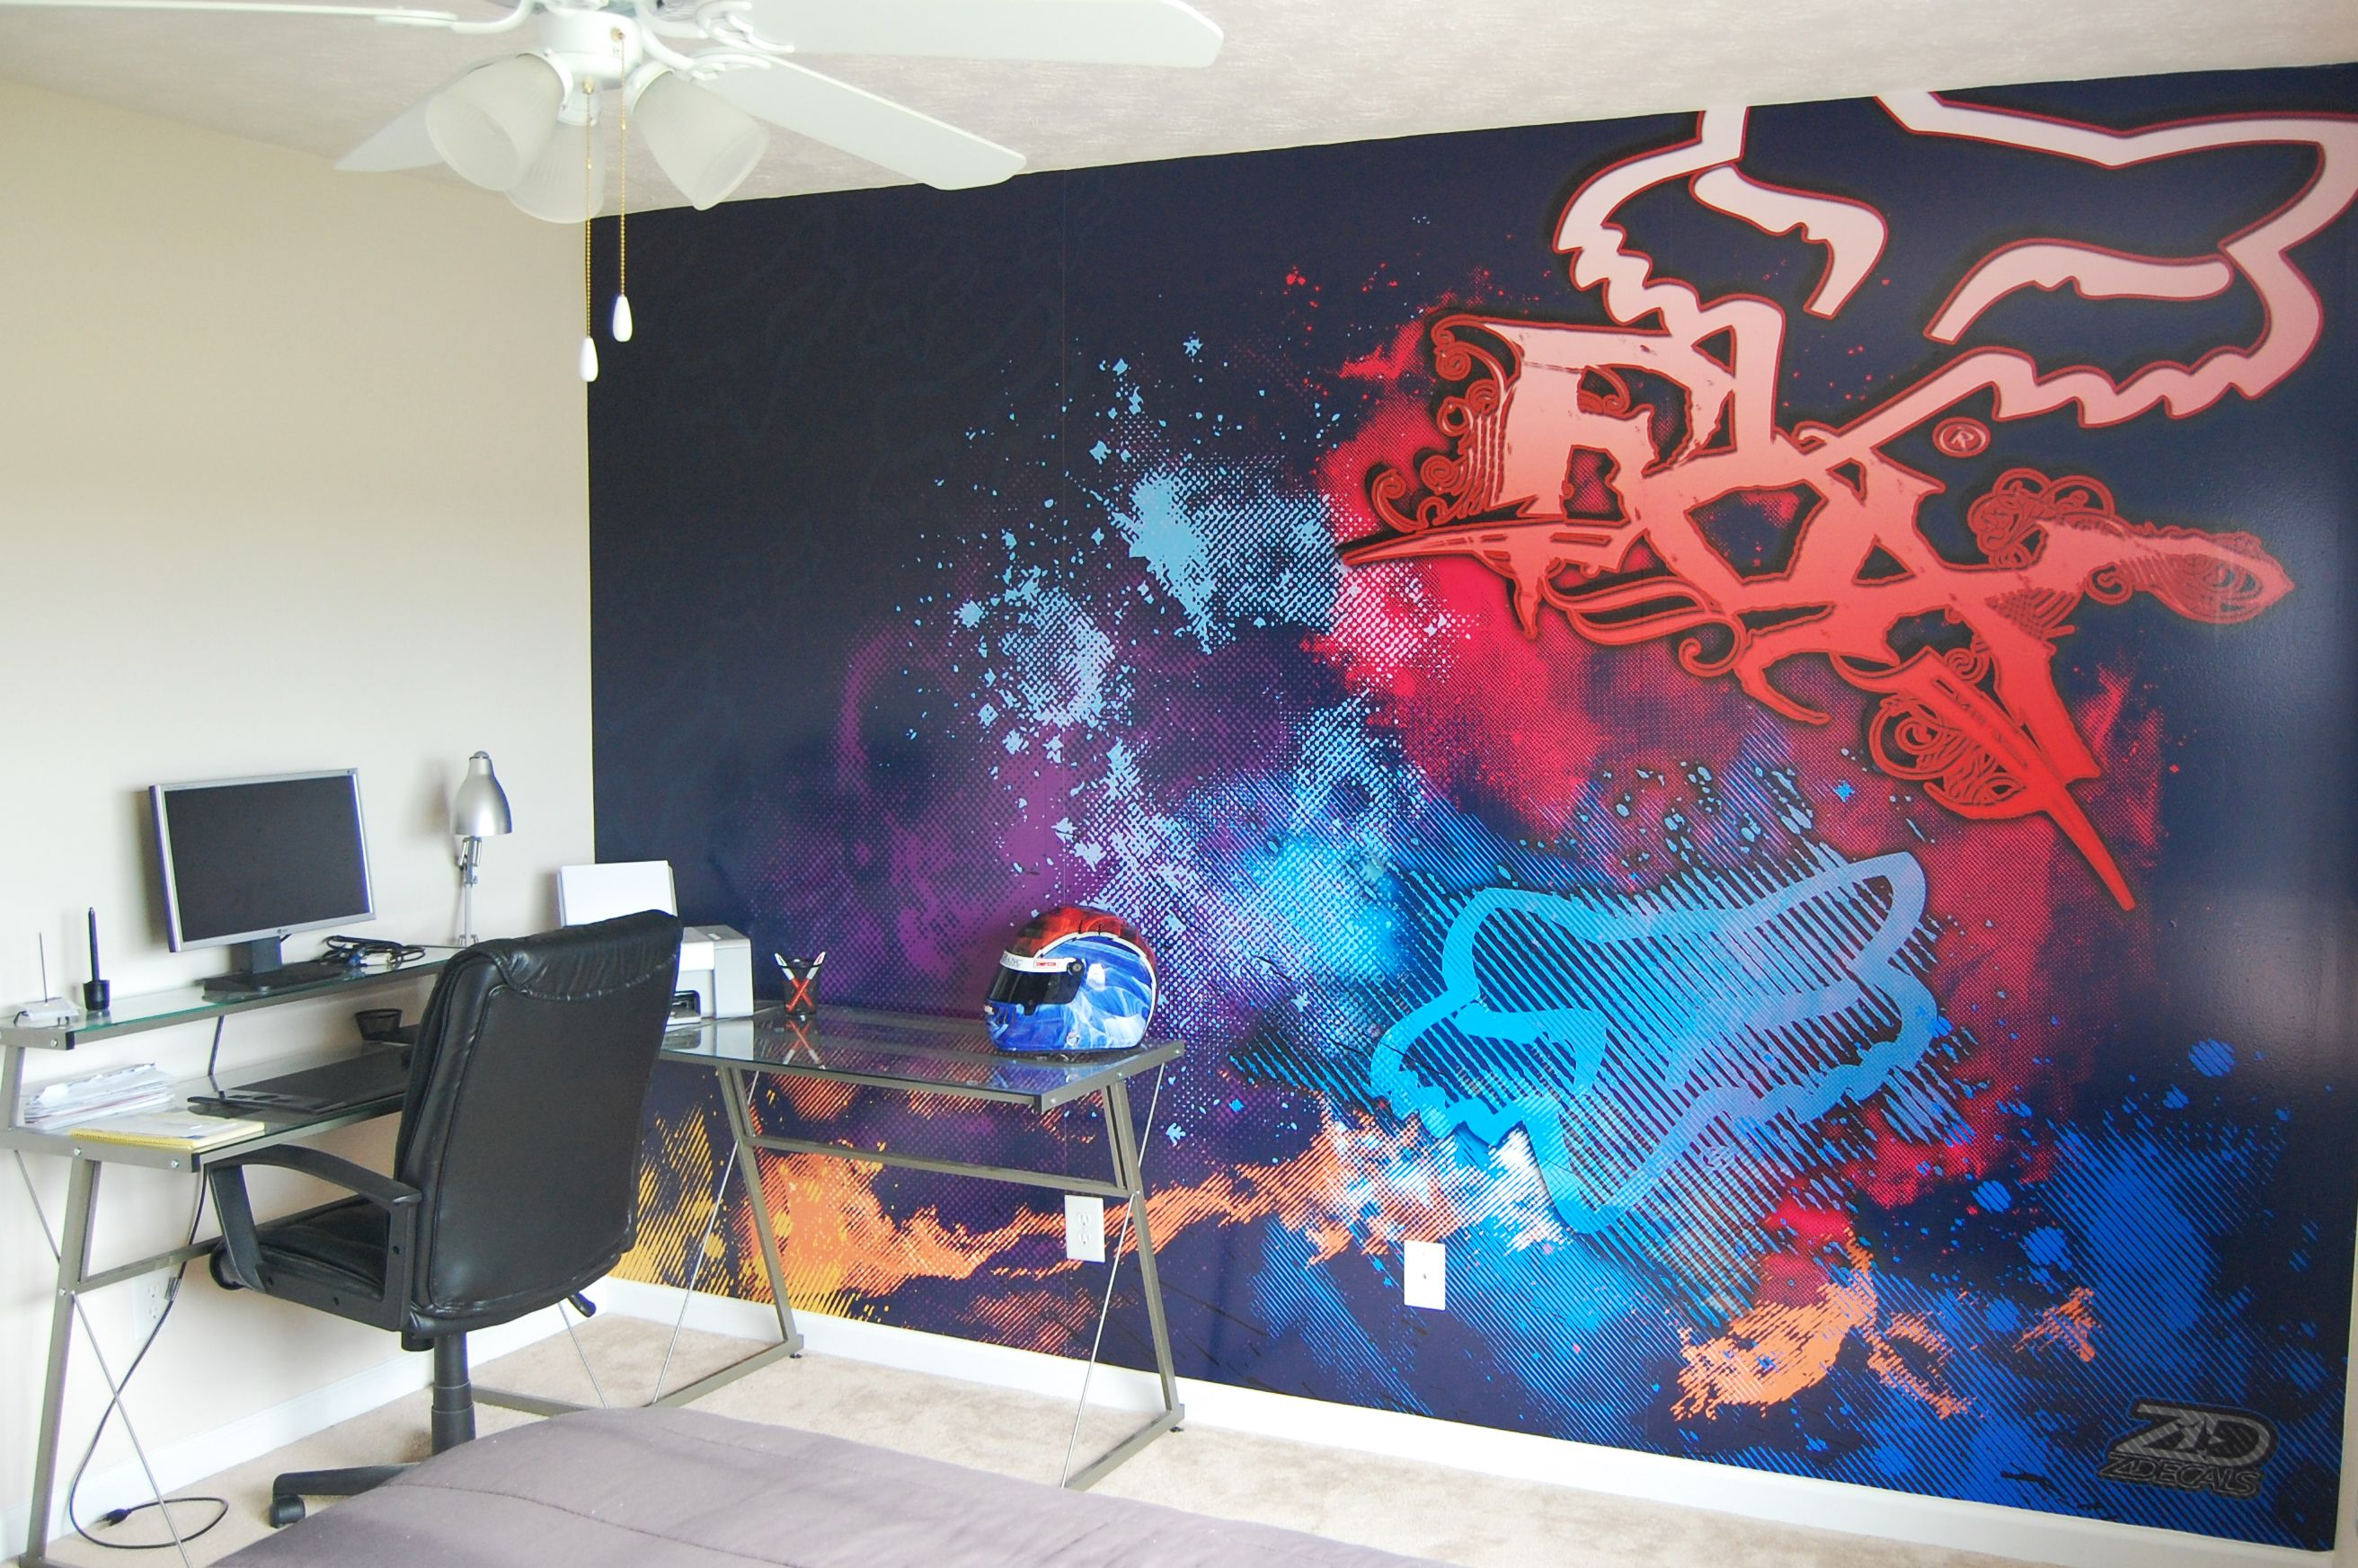 FOX RACING Wall Design-i Love This!